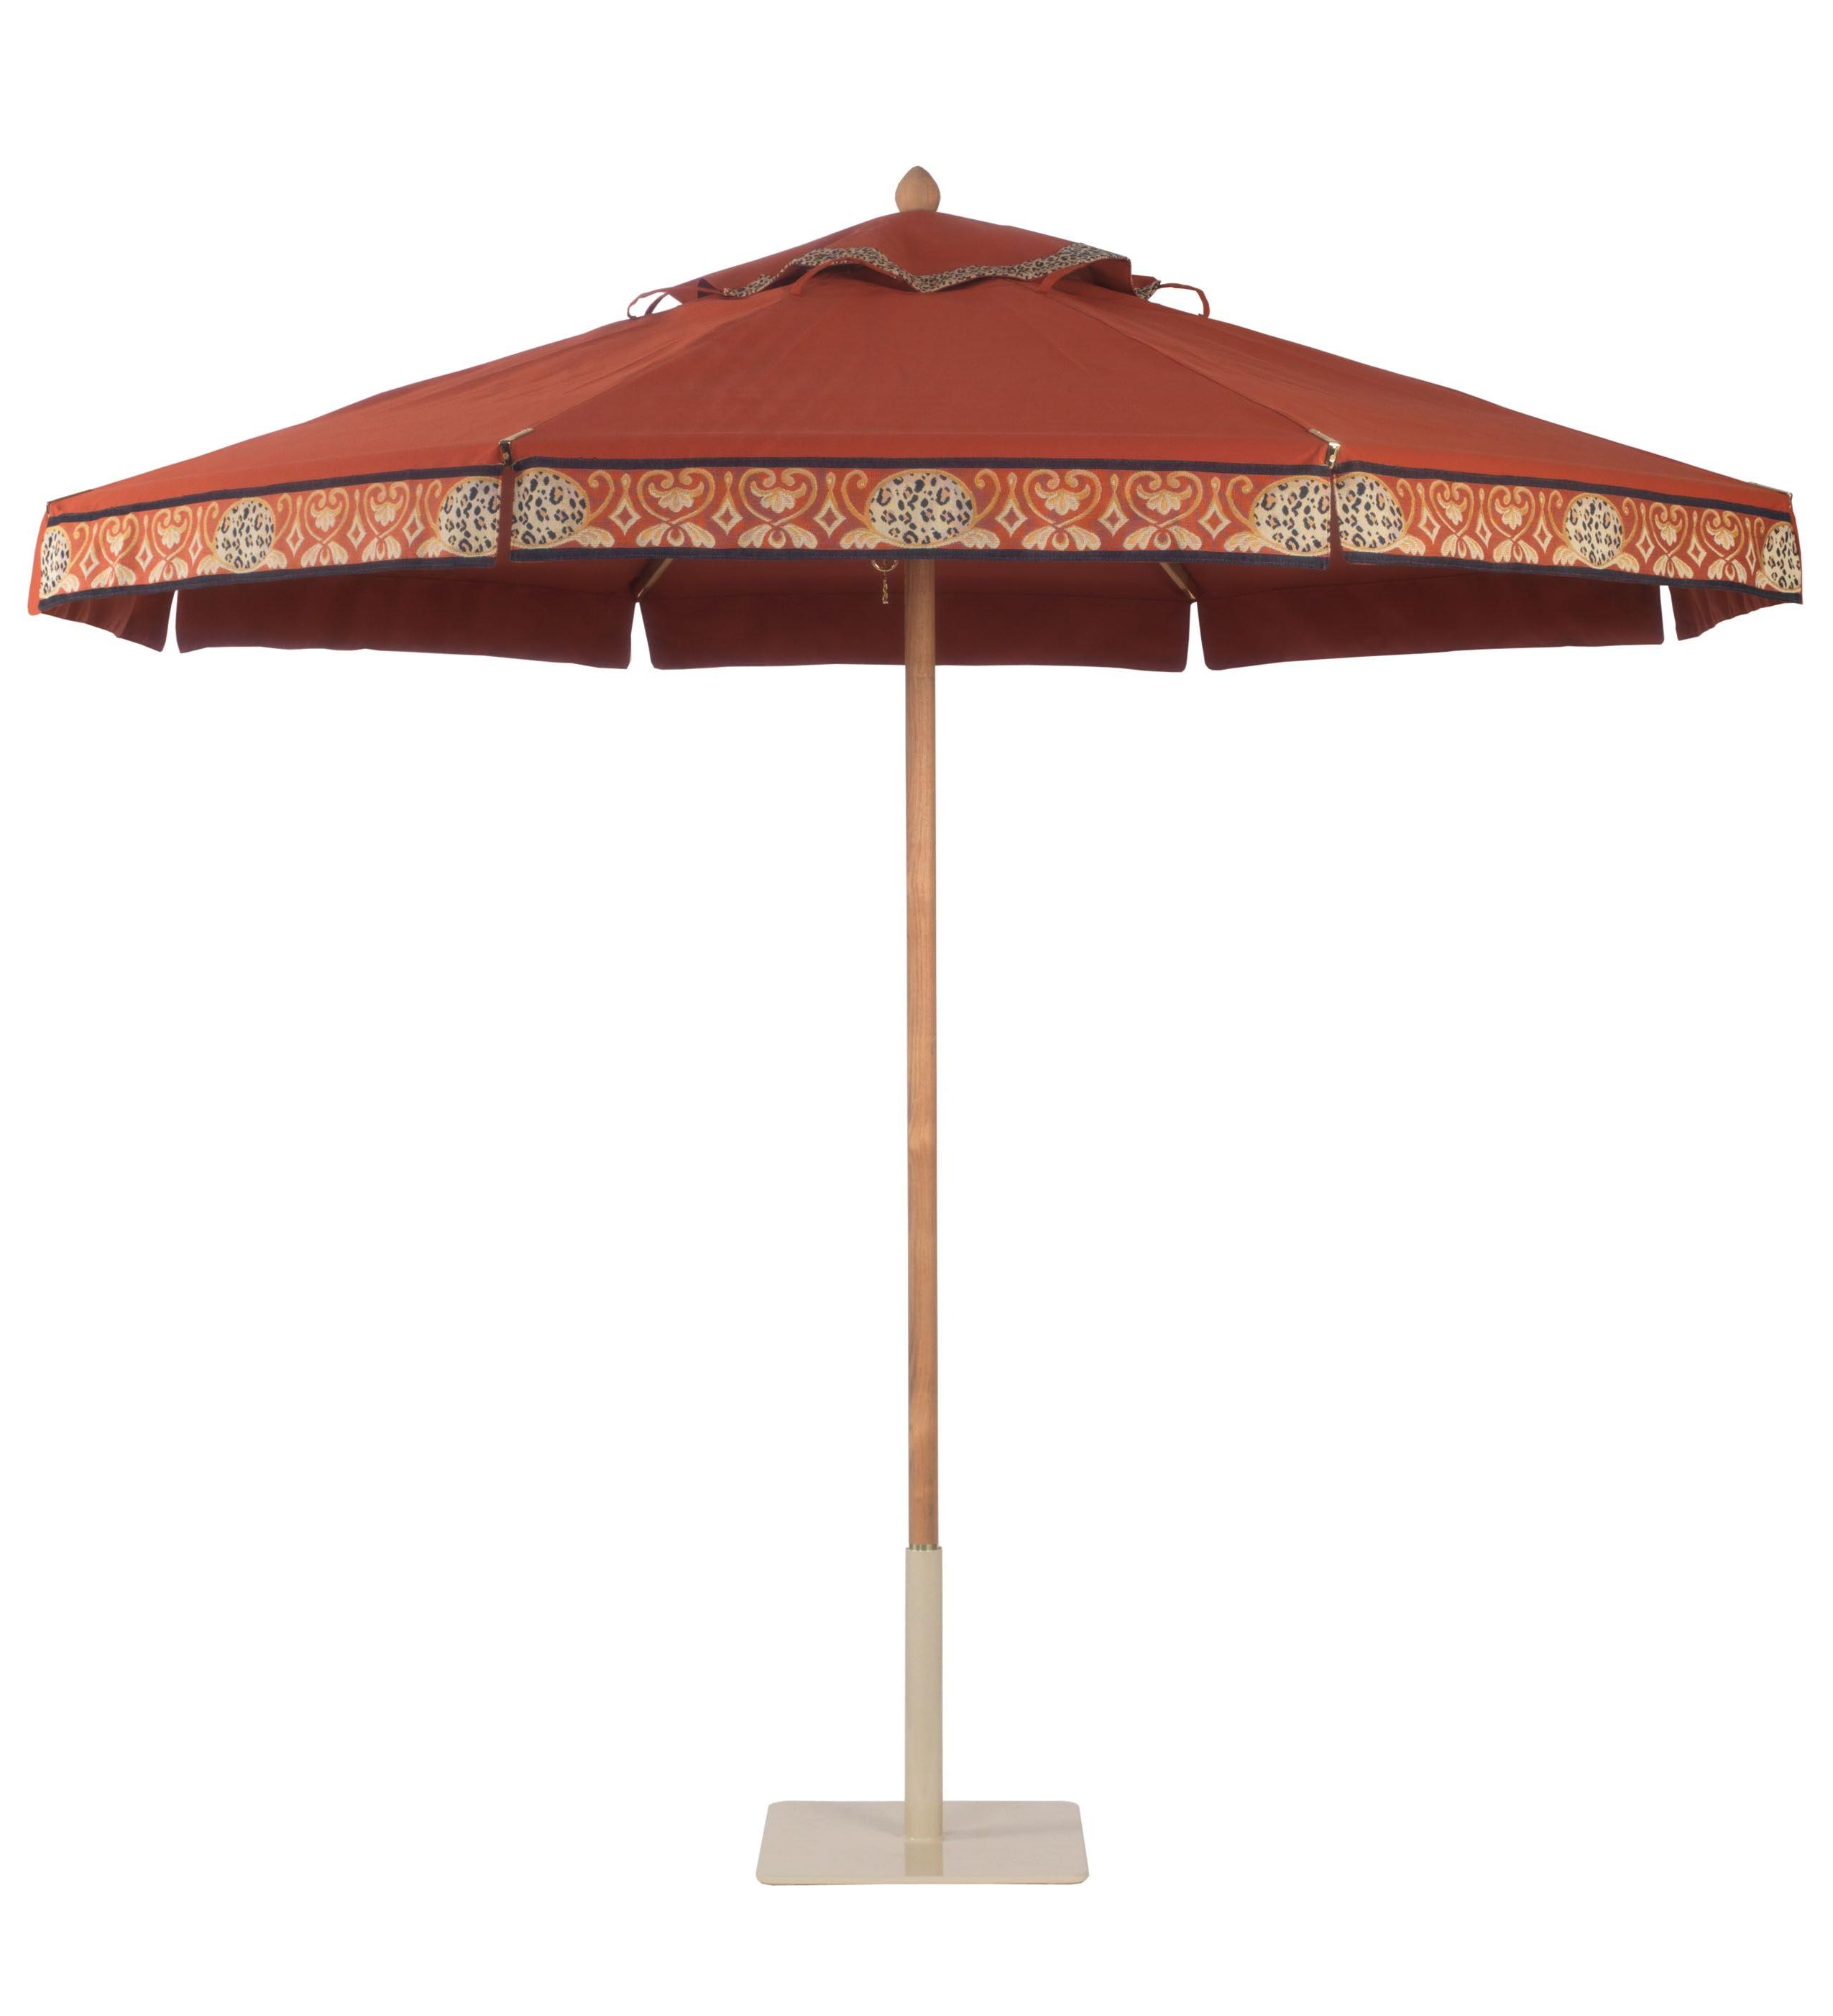 Newest Santa Barbara Umbrella In Teak With Regatta Terra Cotta Canopy And Regarding Capresa Market Umbrellas (View 13 of 20)